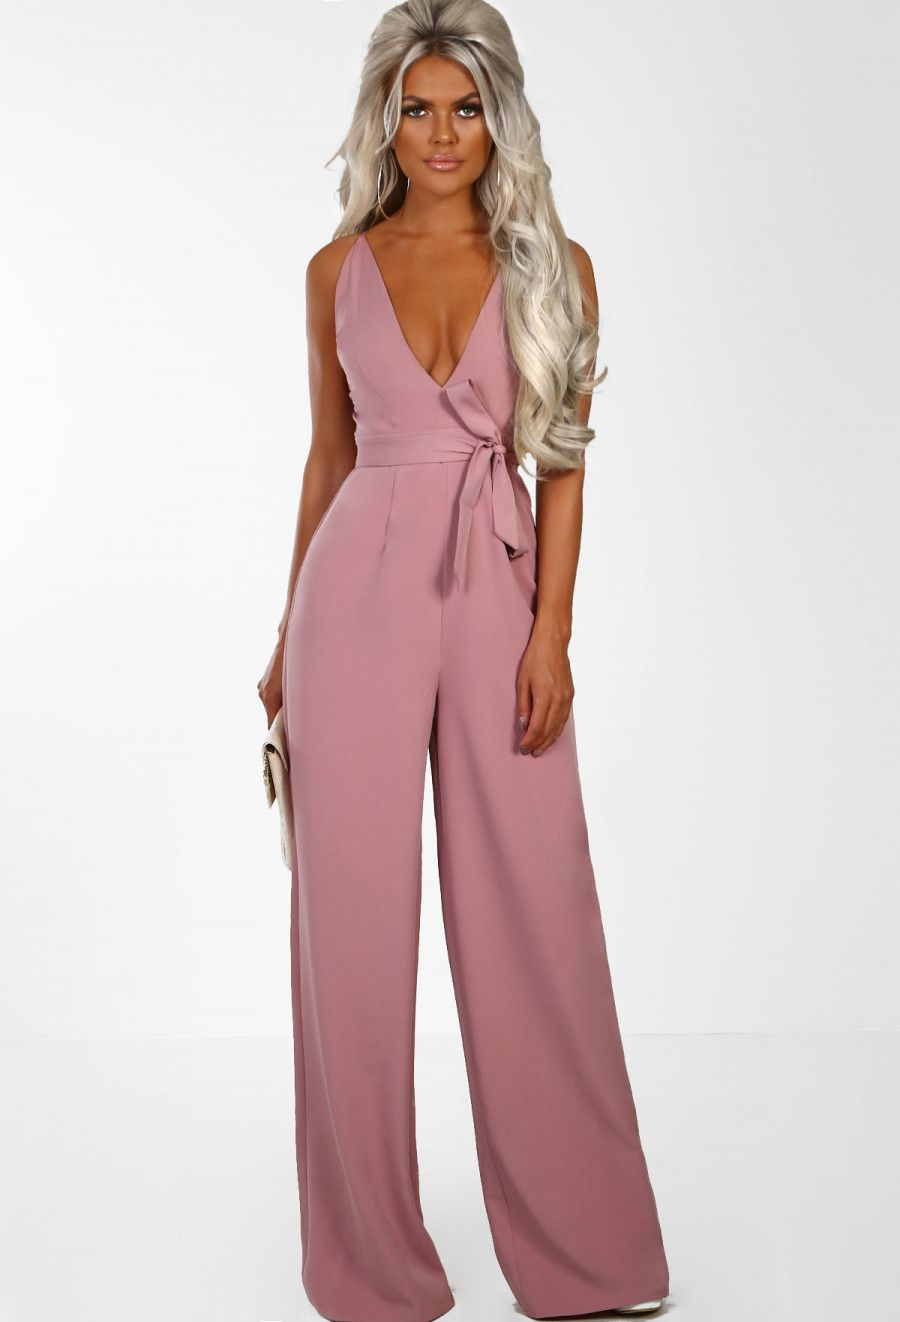 b6c41f60906 Visions Of Love Blush Pink Plunge Wide Leg Jumpsuit - 6